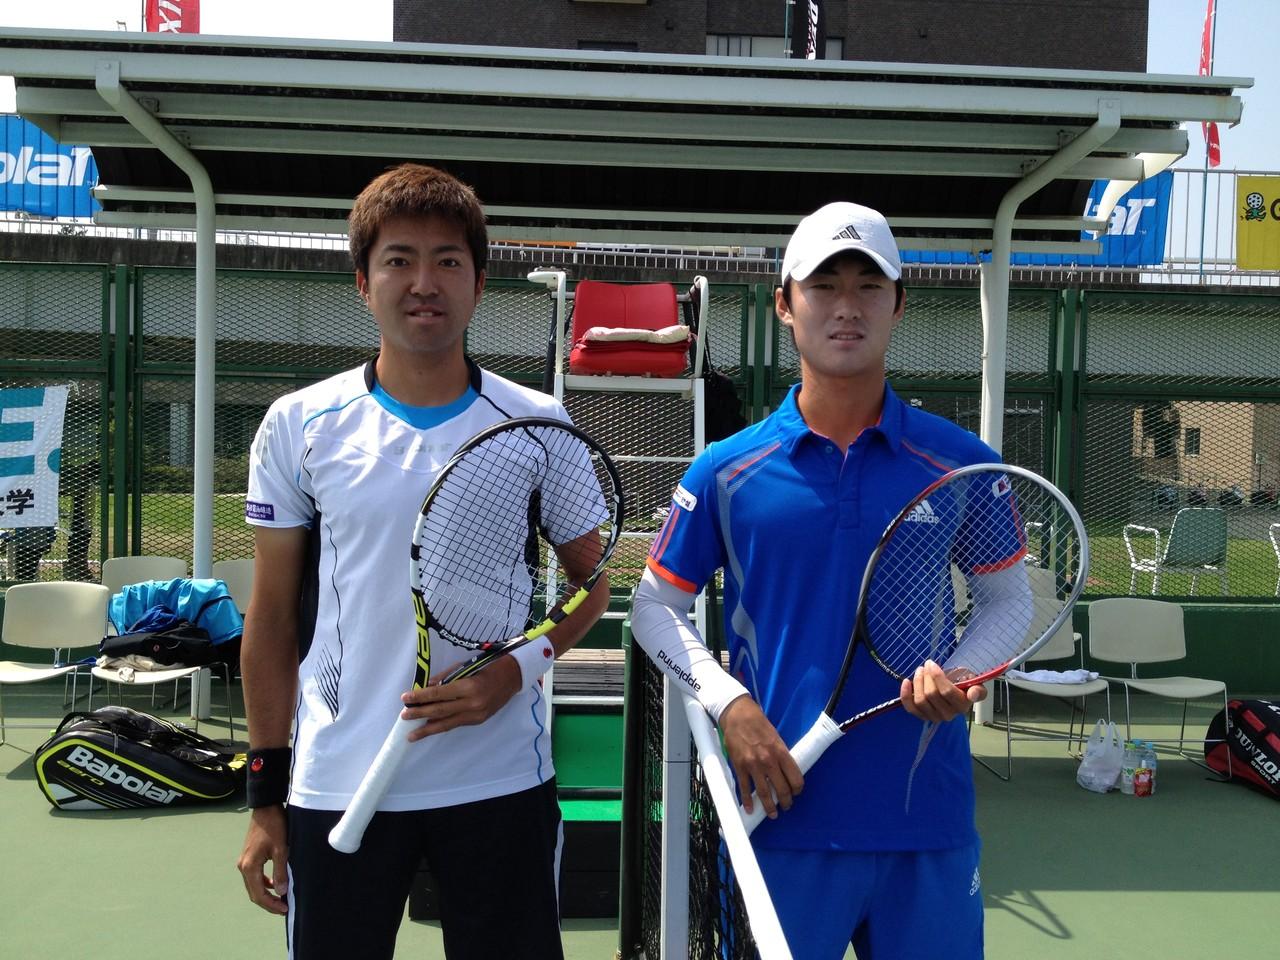 仁木 VS  KIM, Cheong-Eui